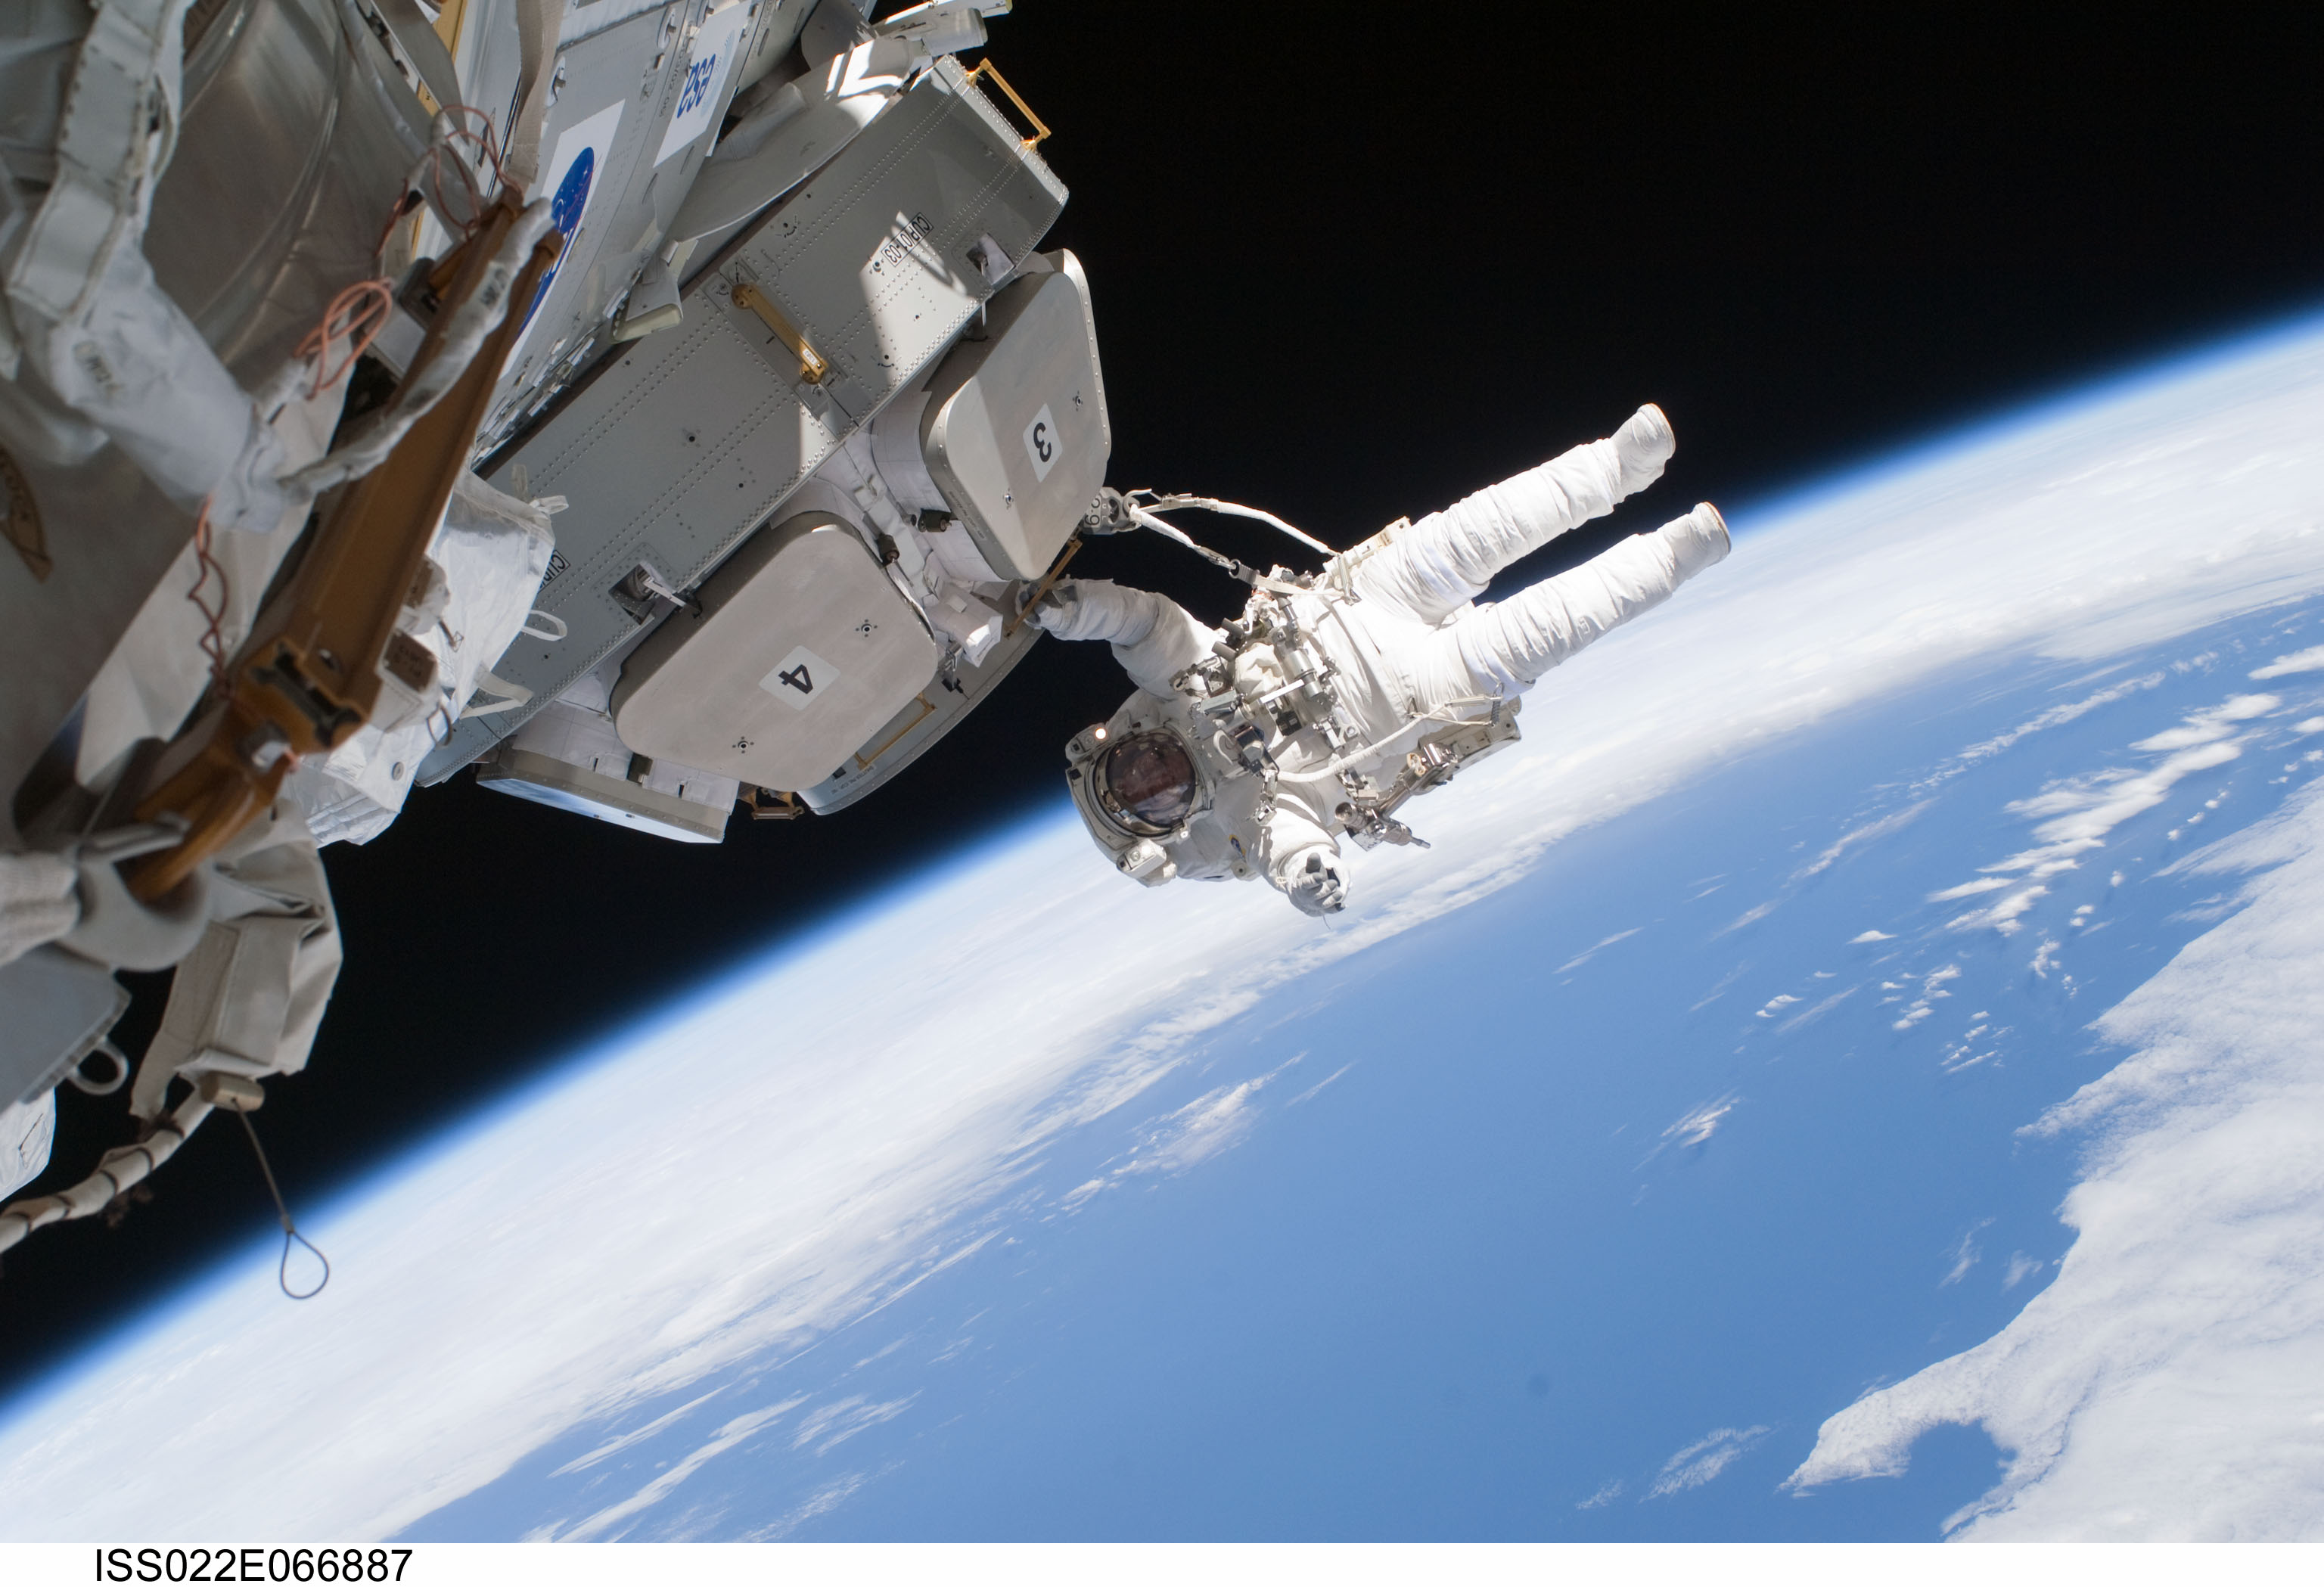 nasa to announce new astronaut class on june 7 nasa